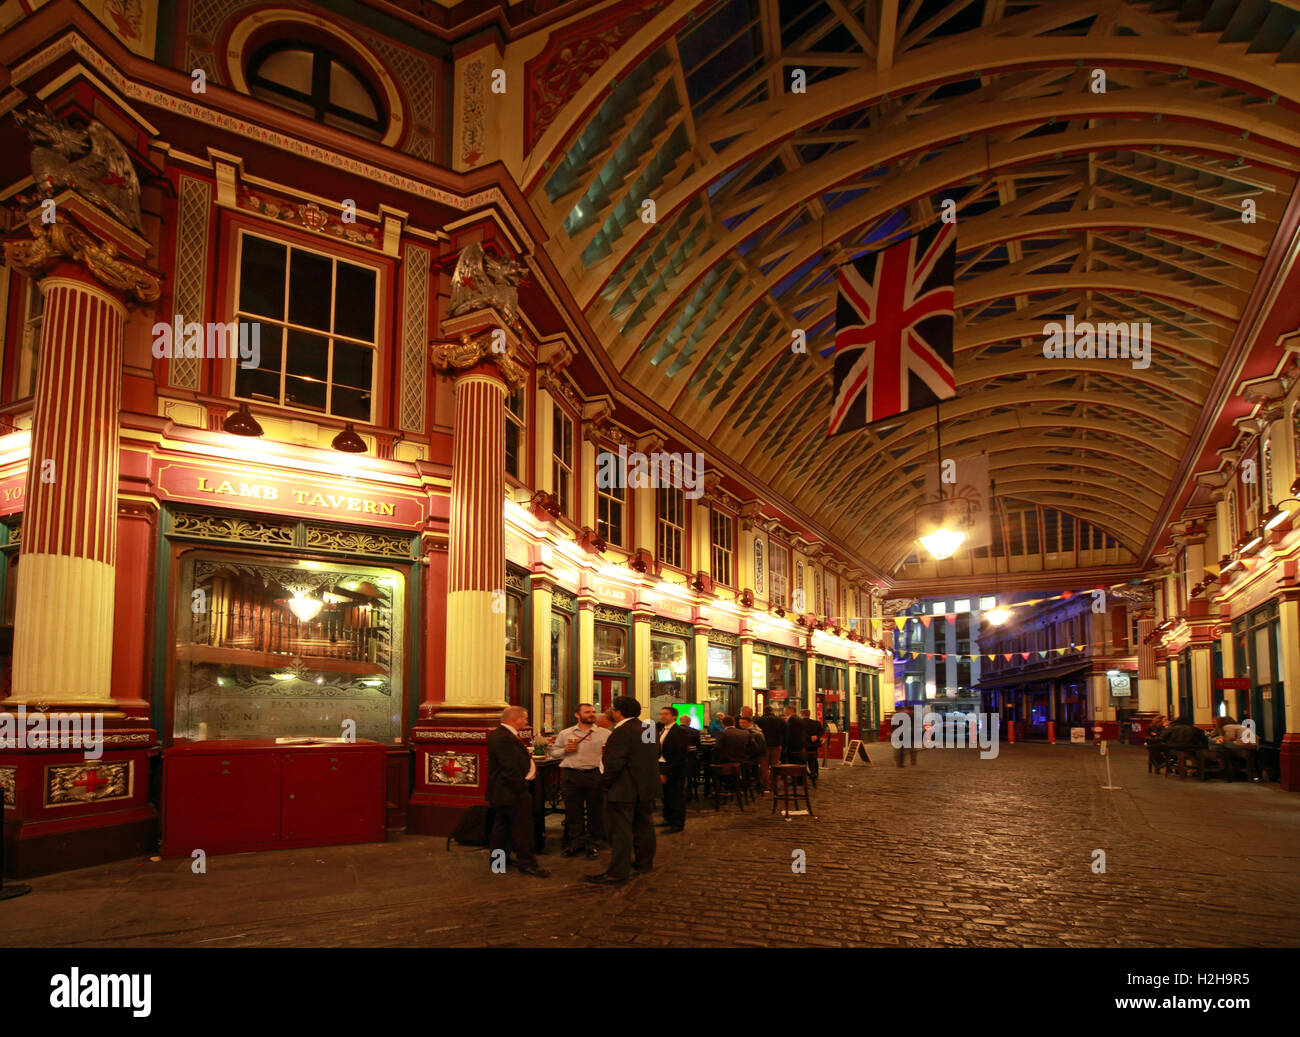 Laden Sie dieses Alamy Stockfoto Leadenhall Market in der Nacht, City Of London, England, UK - Panorama - H2H9R5